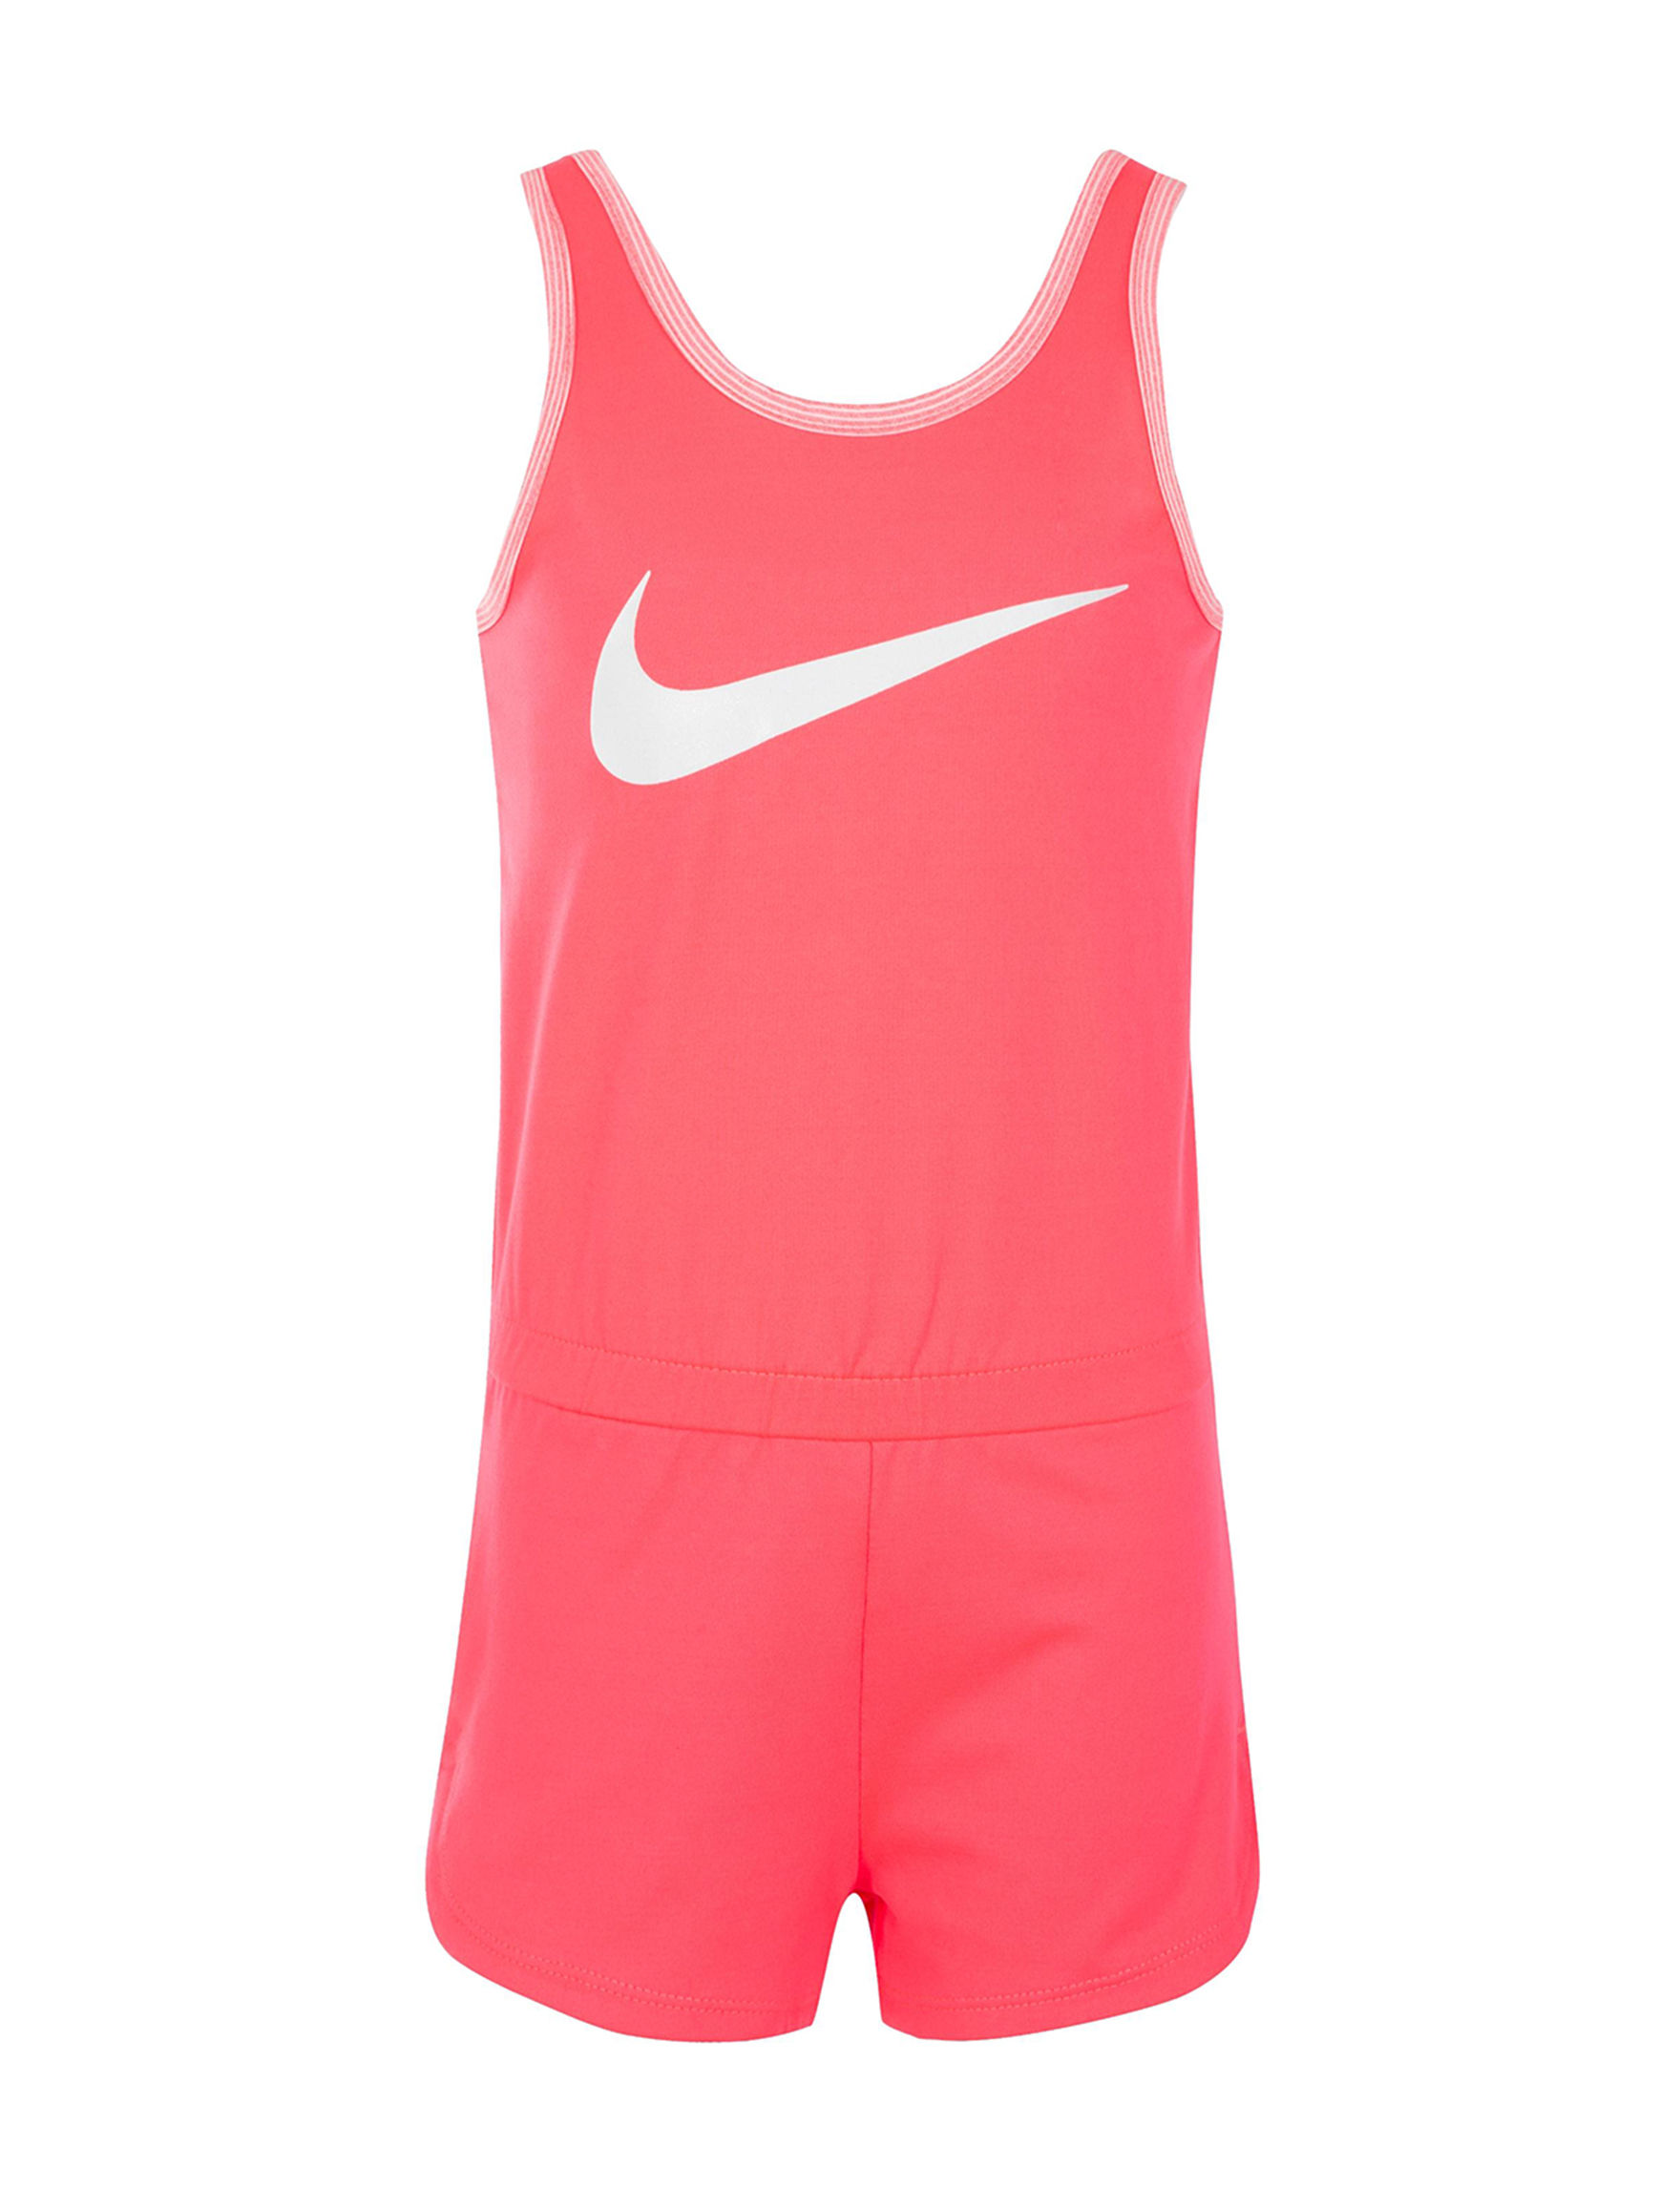 Nike Pink Stretch